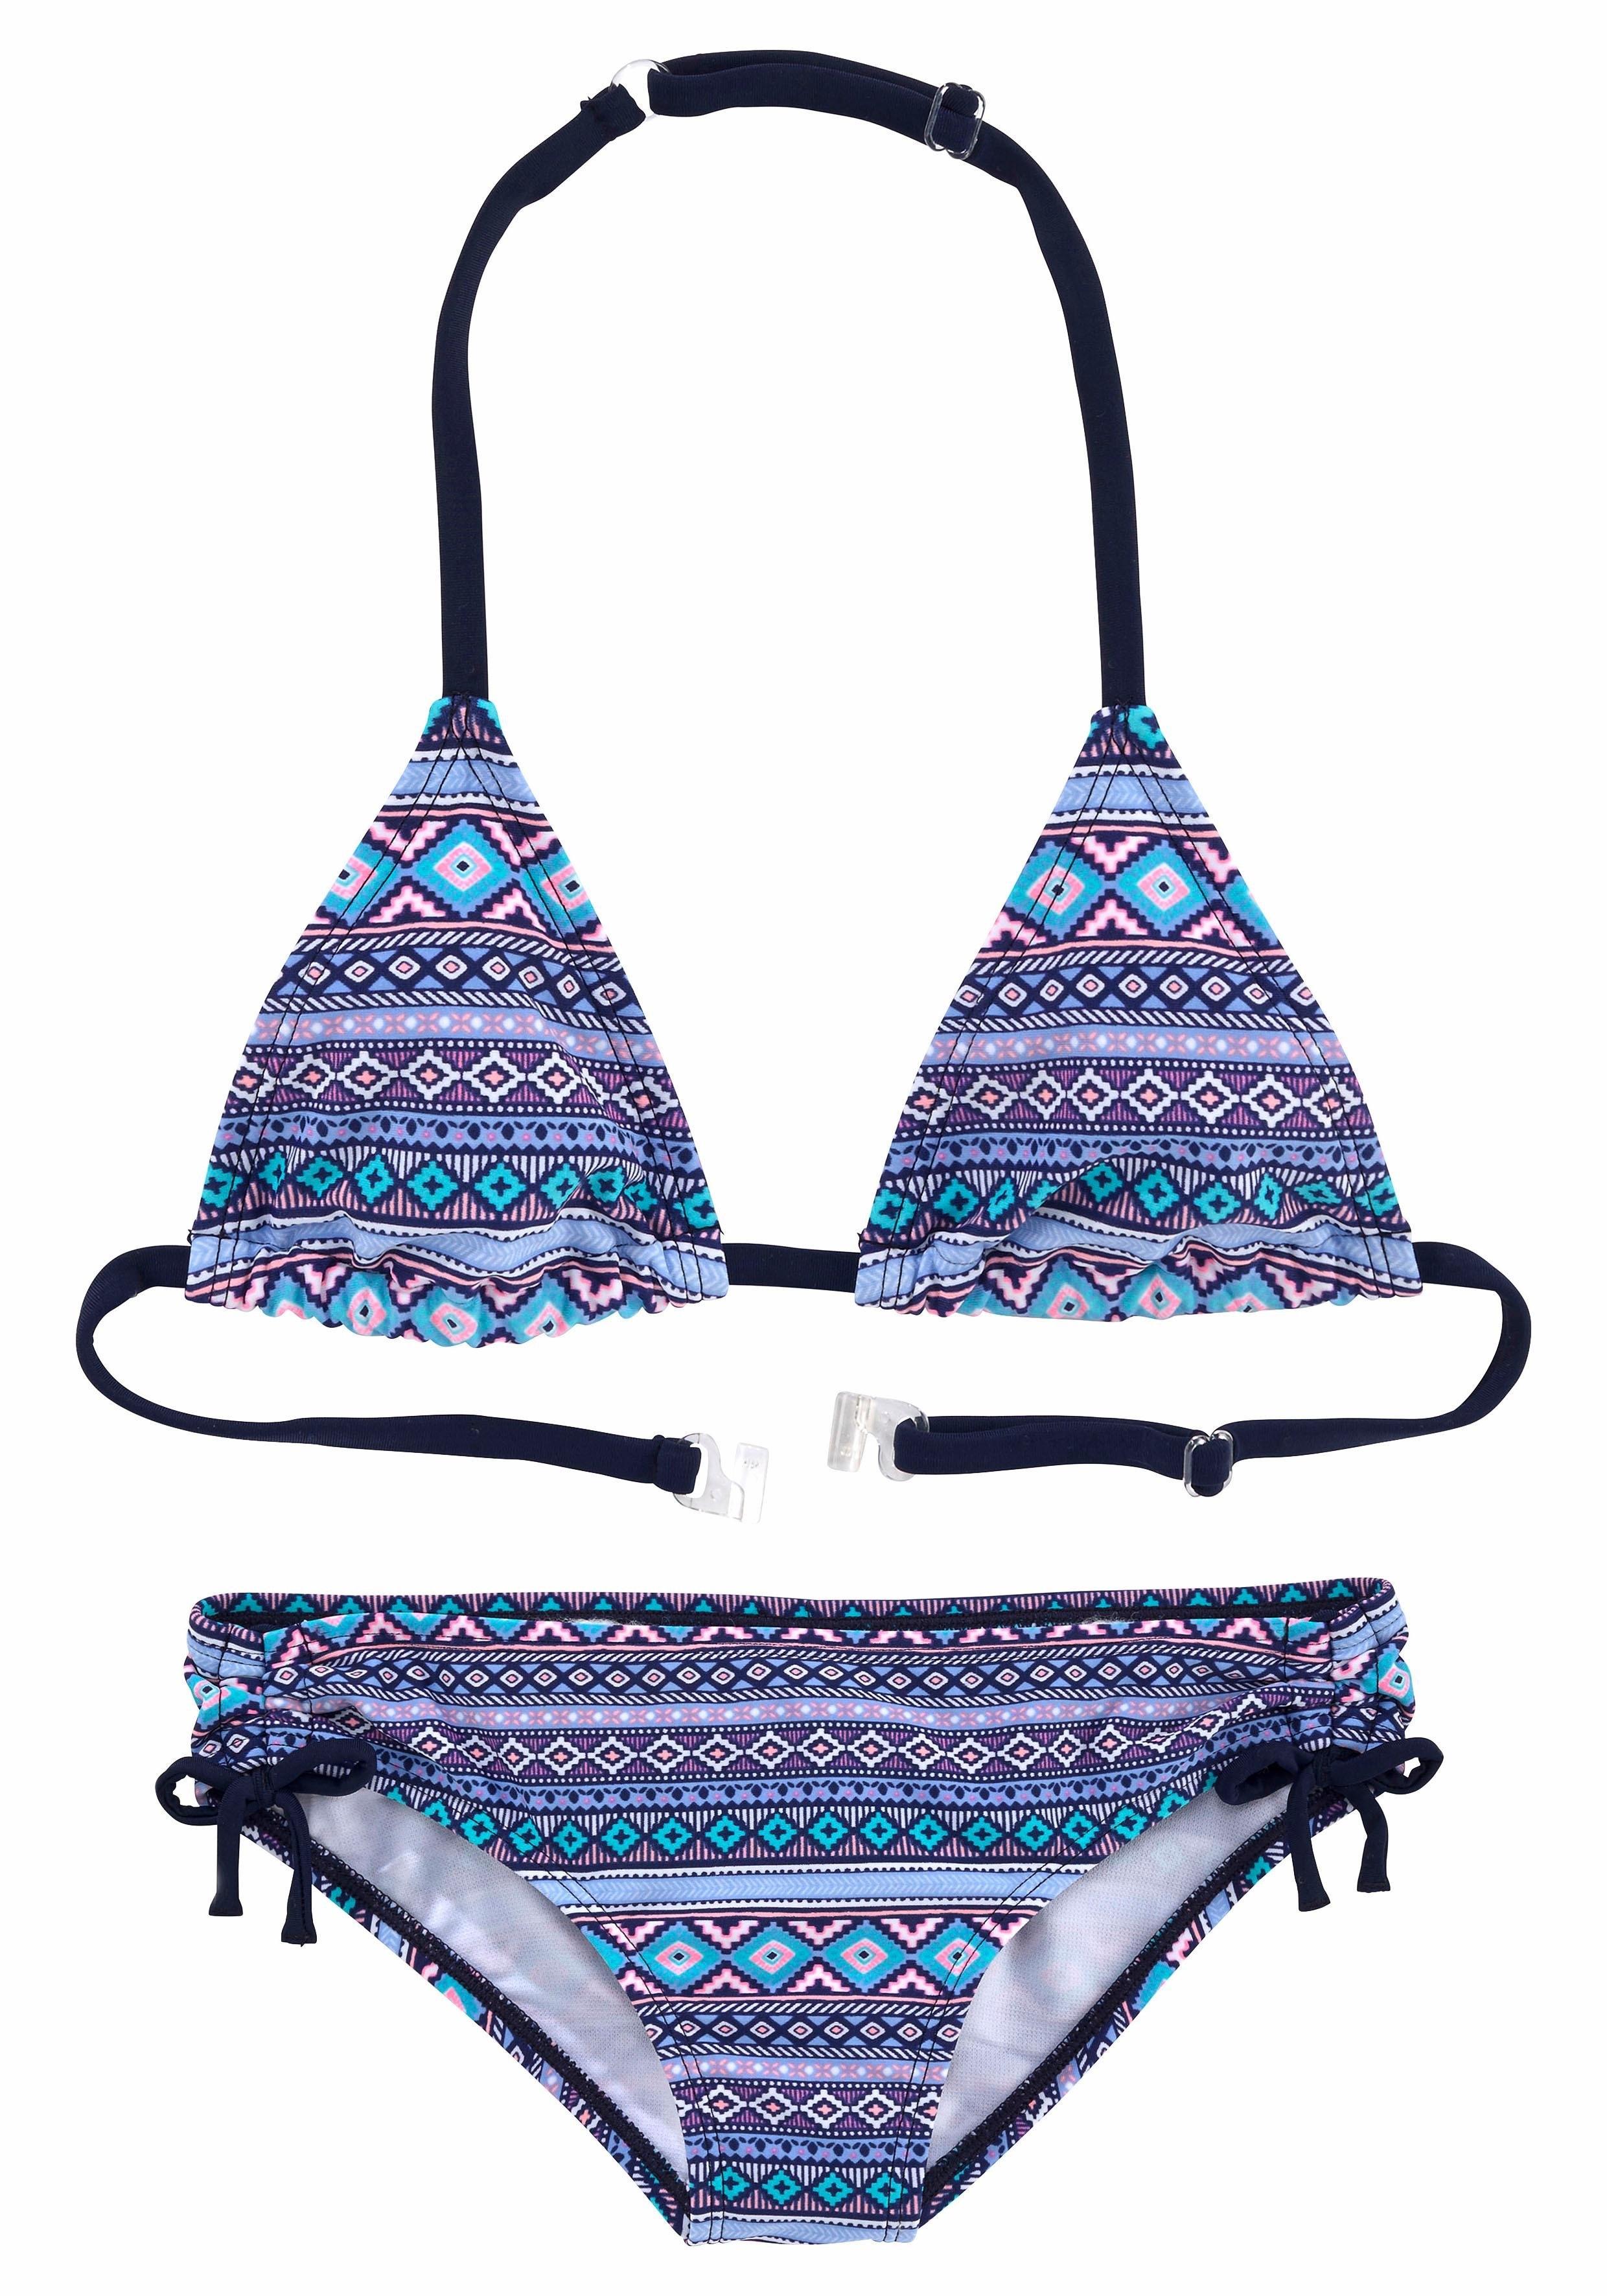 s.Oliver Beachwear s.Oliver RED LABEL Beachwear triangelbikini voordelig en veilig online kopen